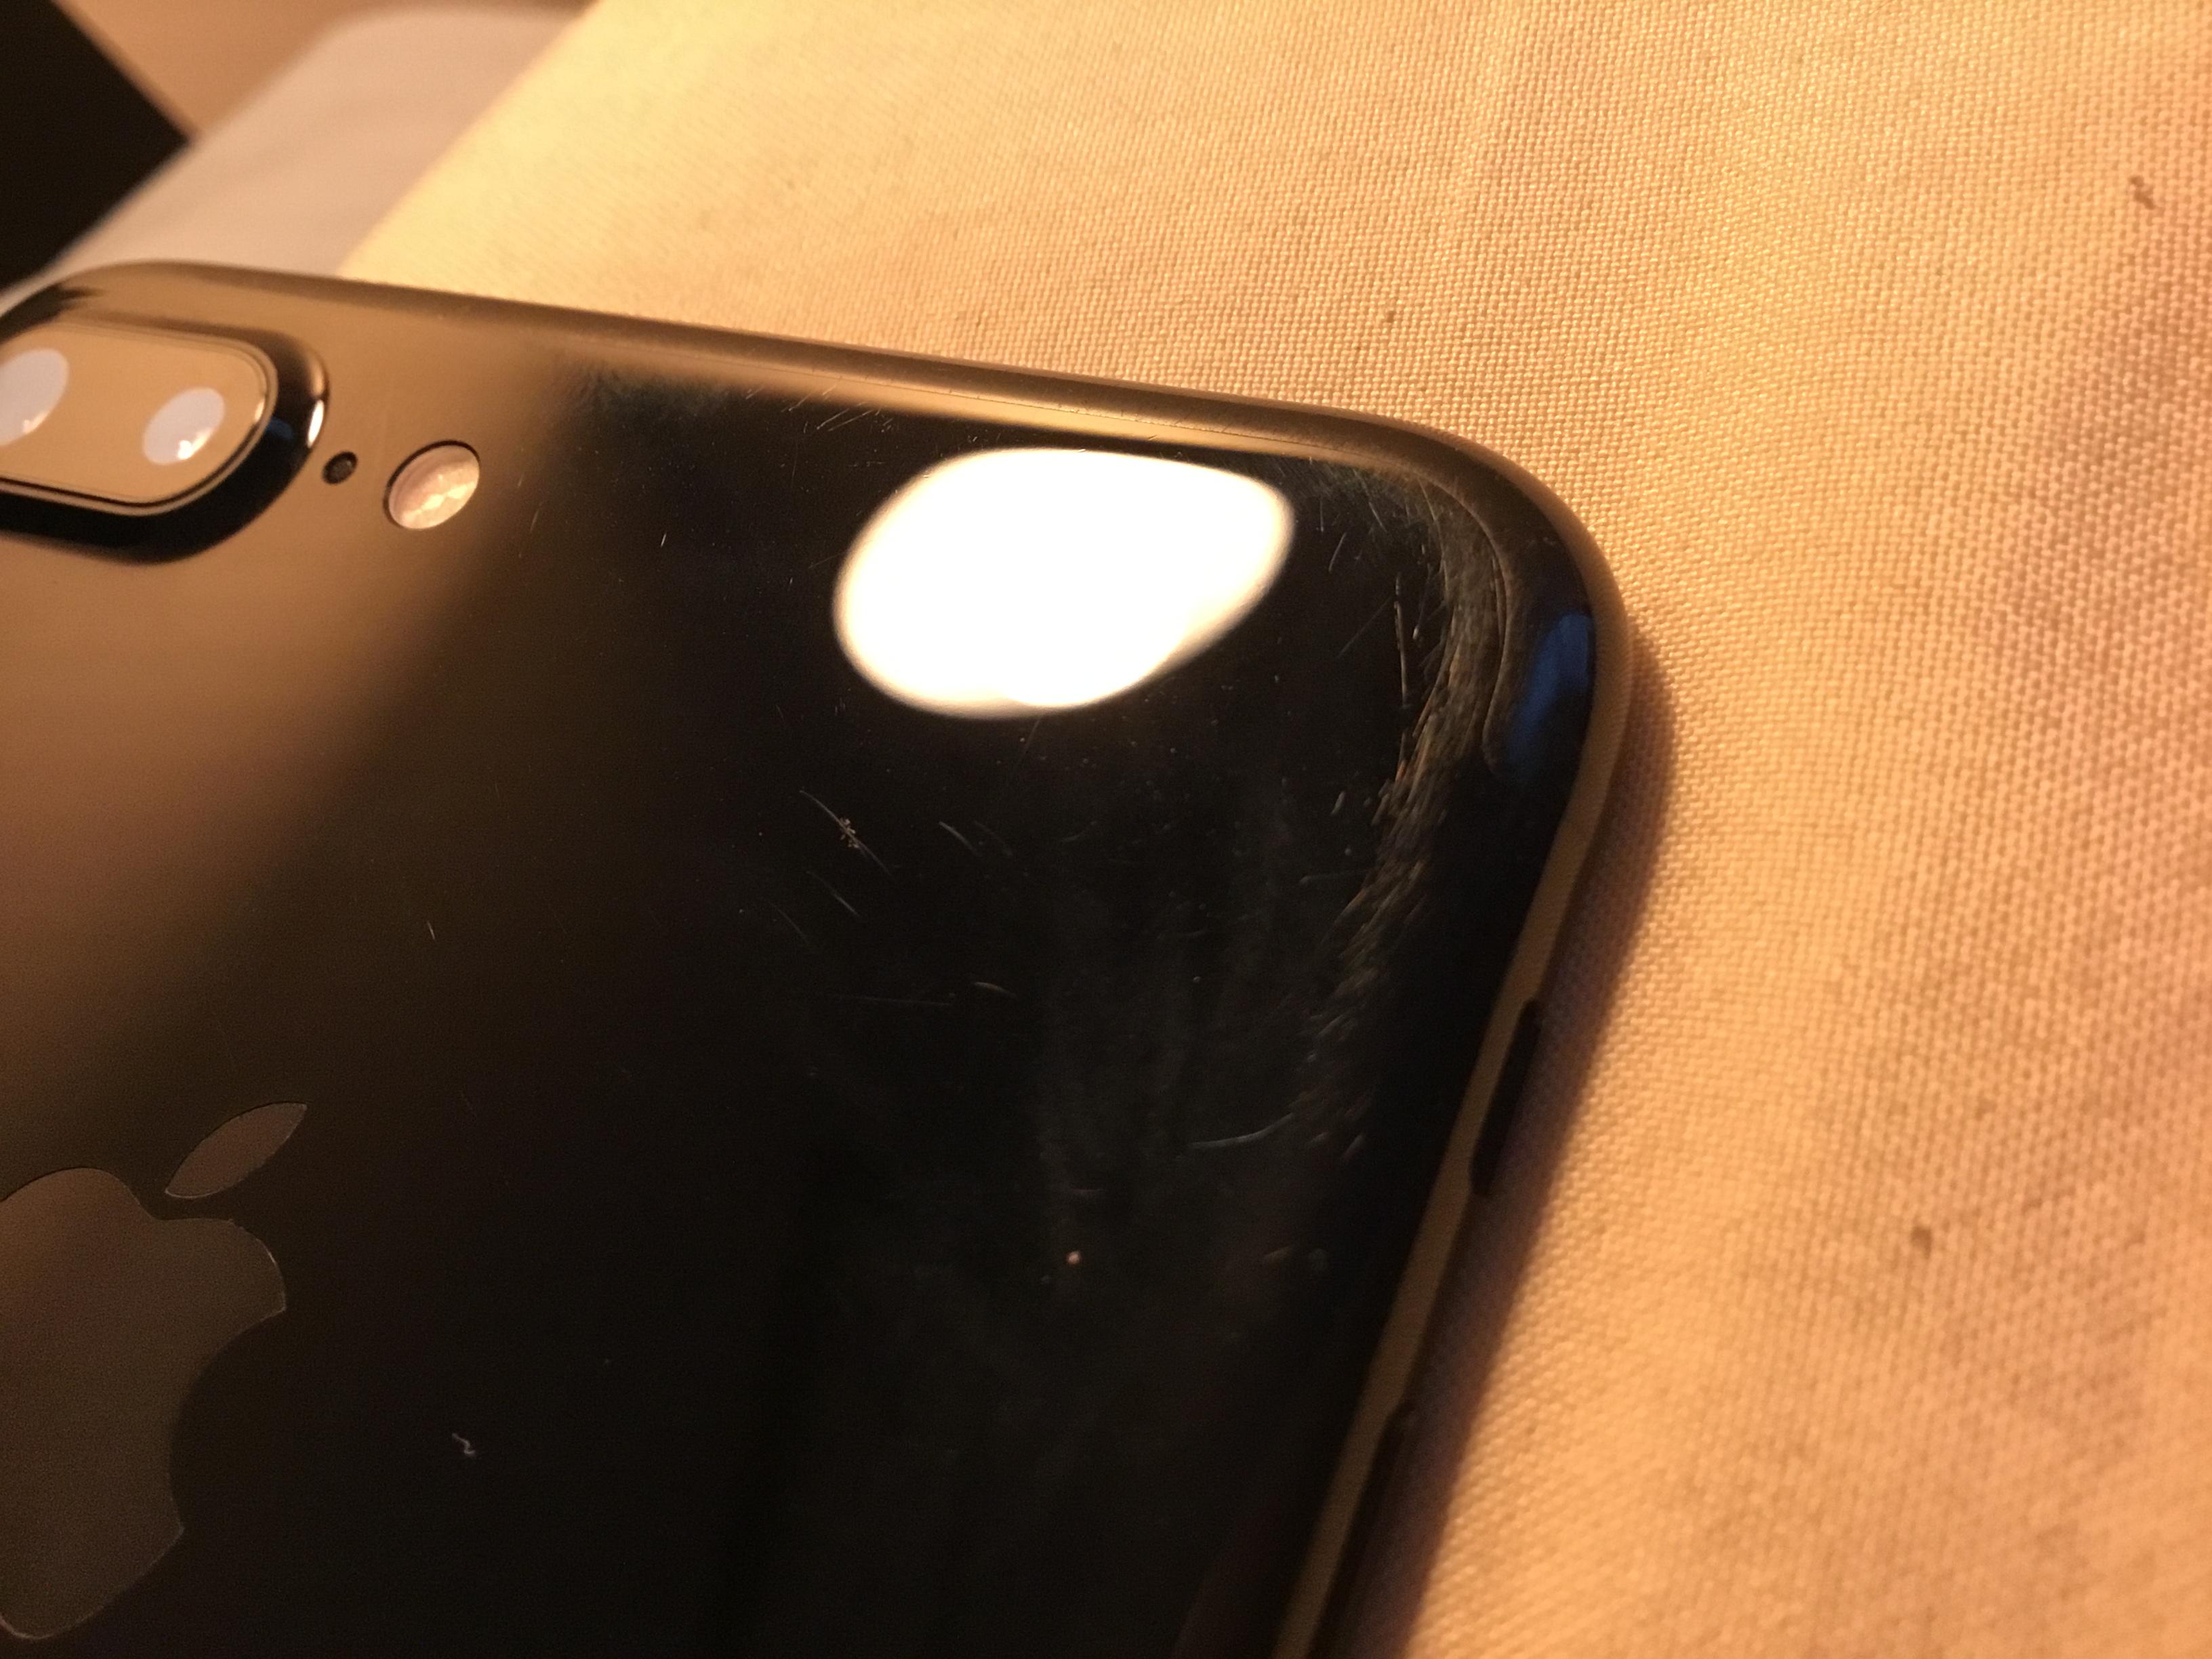 iphone-7-jet-black-3-luni-folosire-1